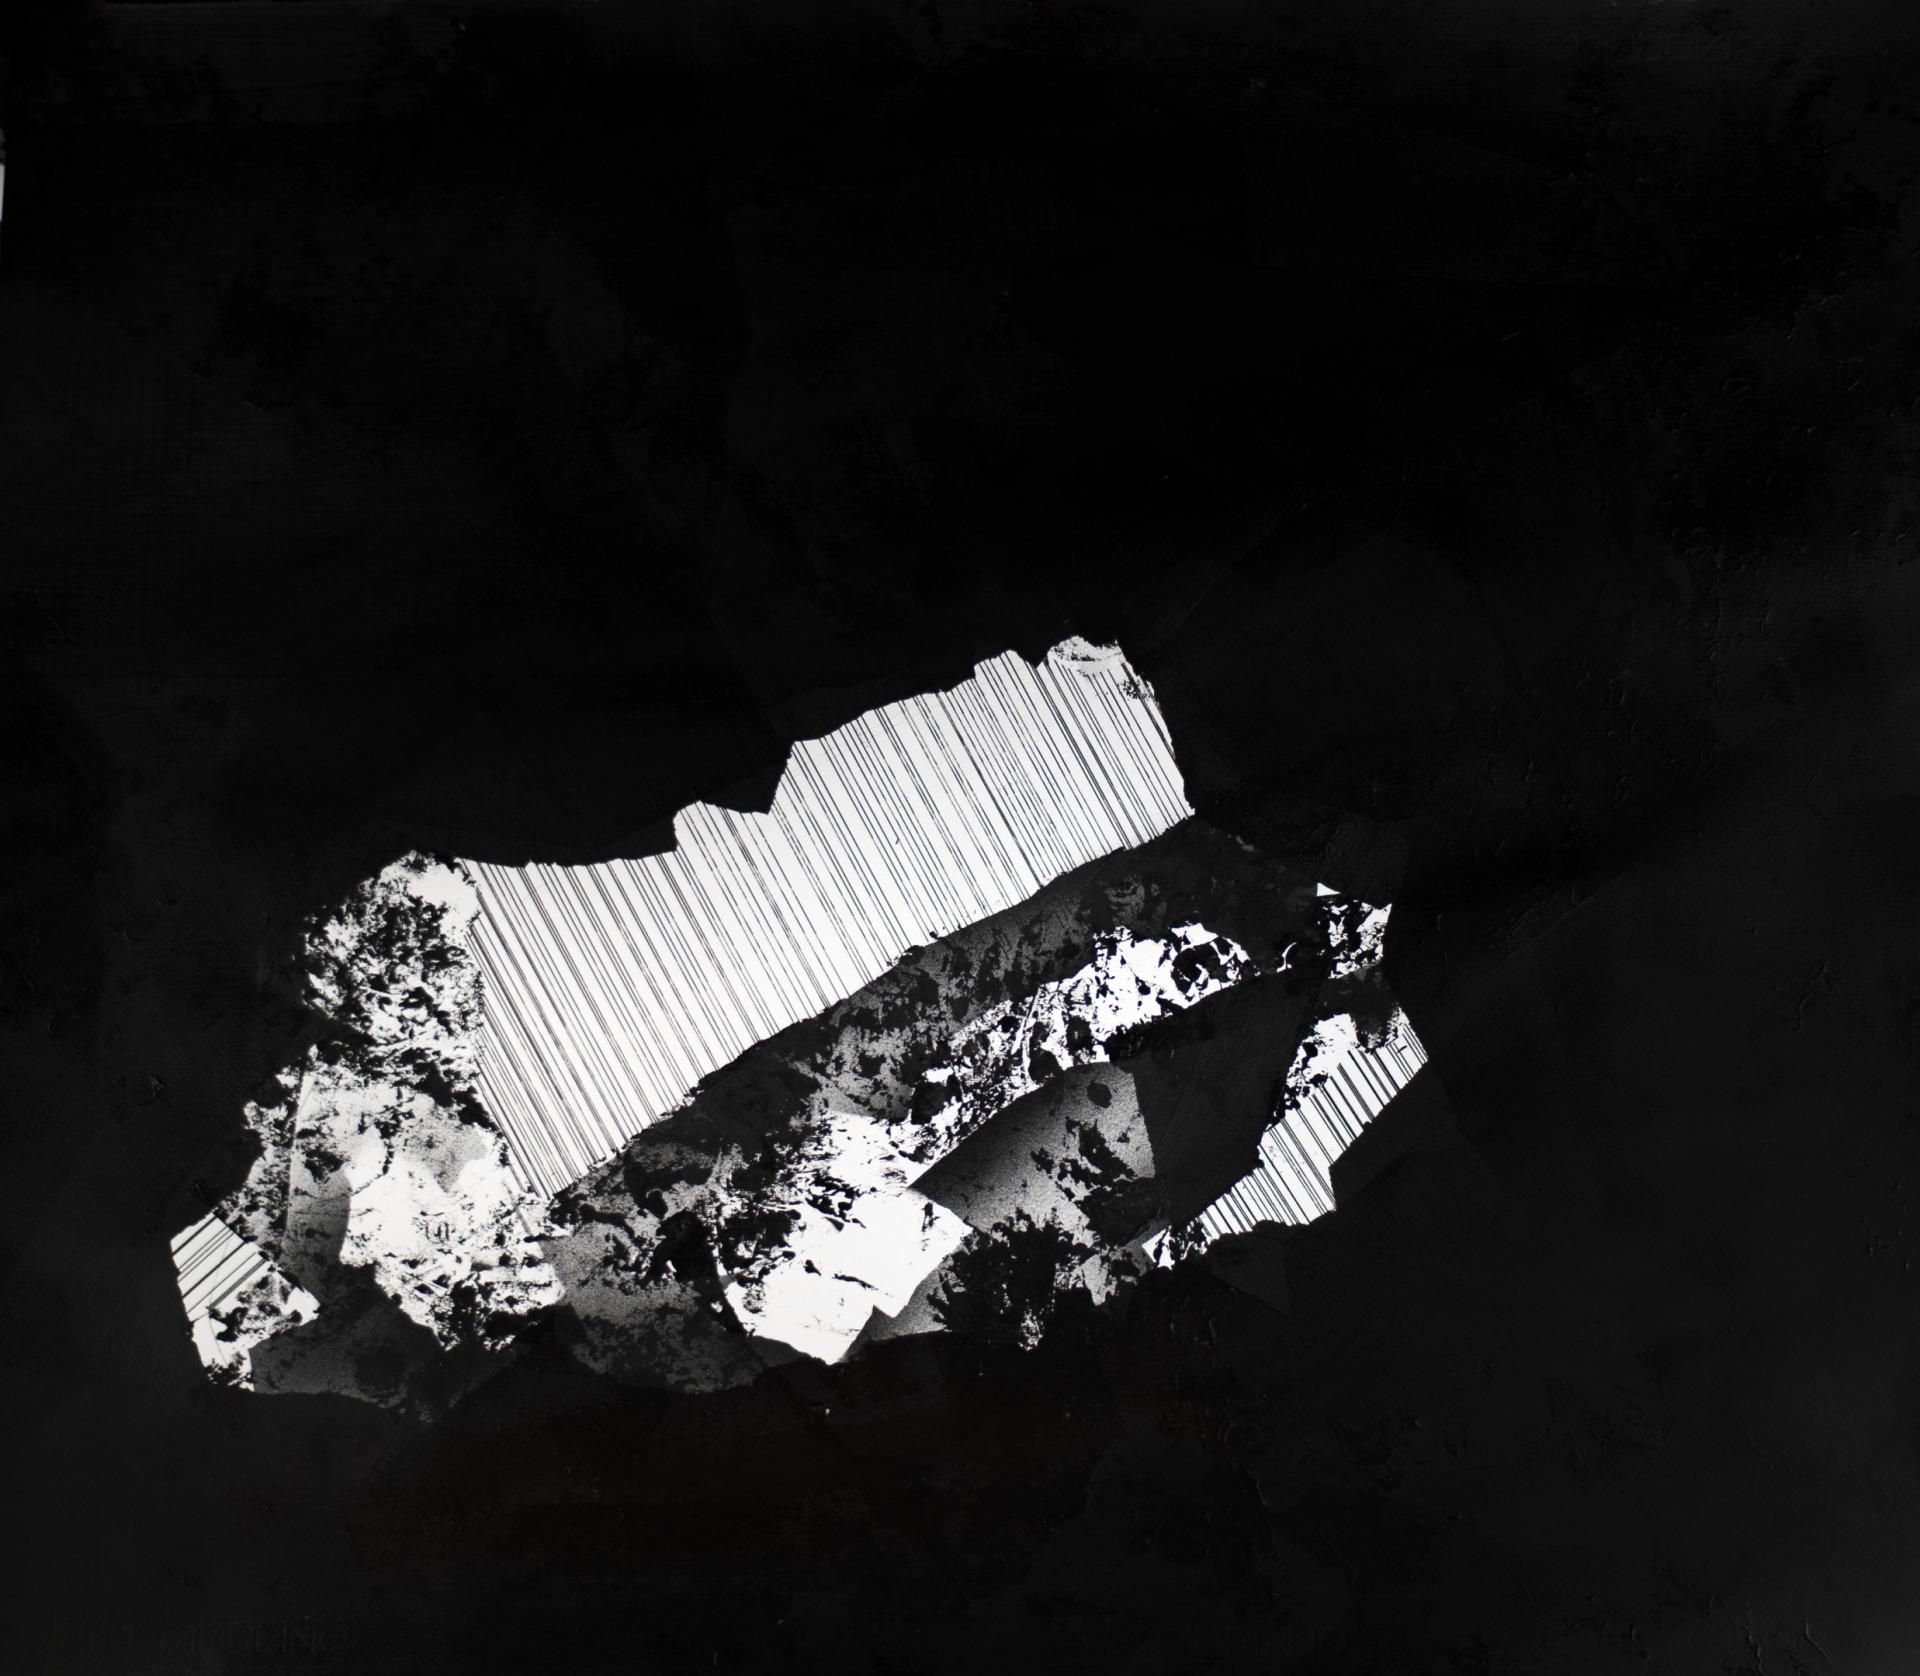 Contemporary art from Gyula Sági | op020321. 5